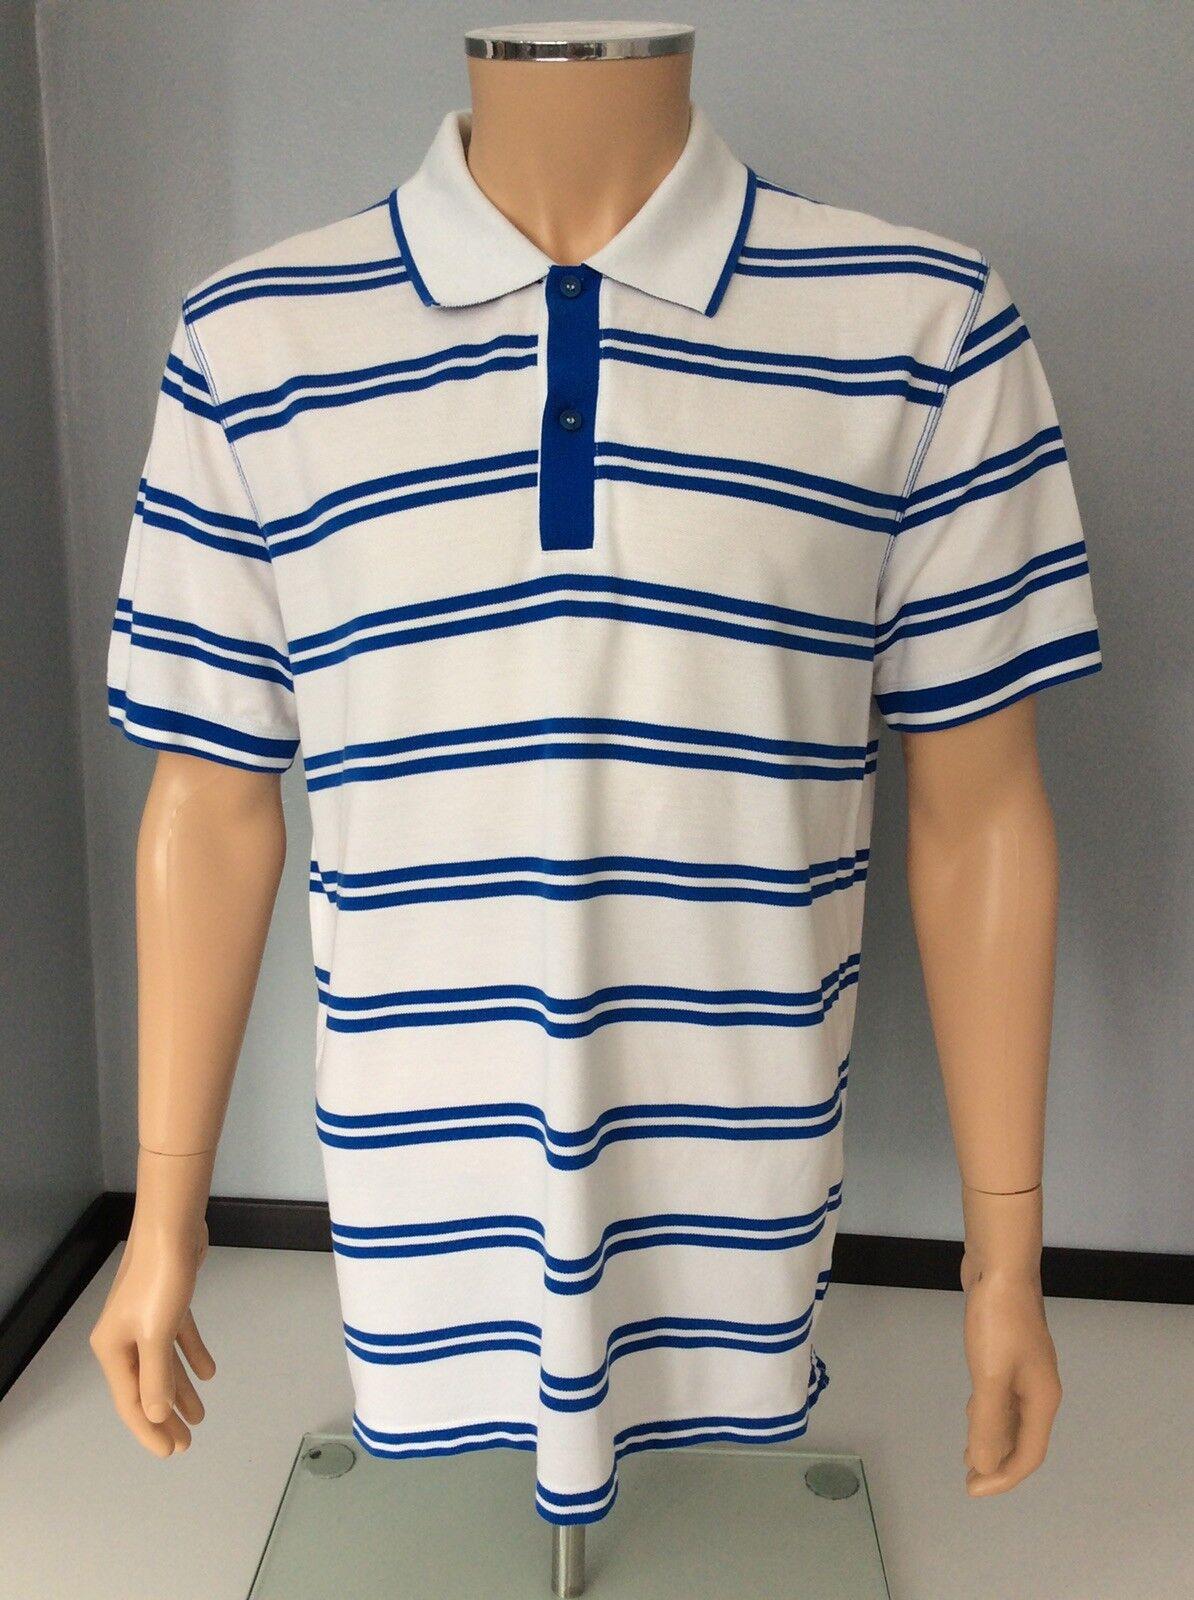 Hugo Boss Janis Mens Polo T Shirt, Size Xxl, 2xl, Slim Fit Vgc